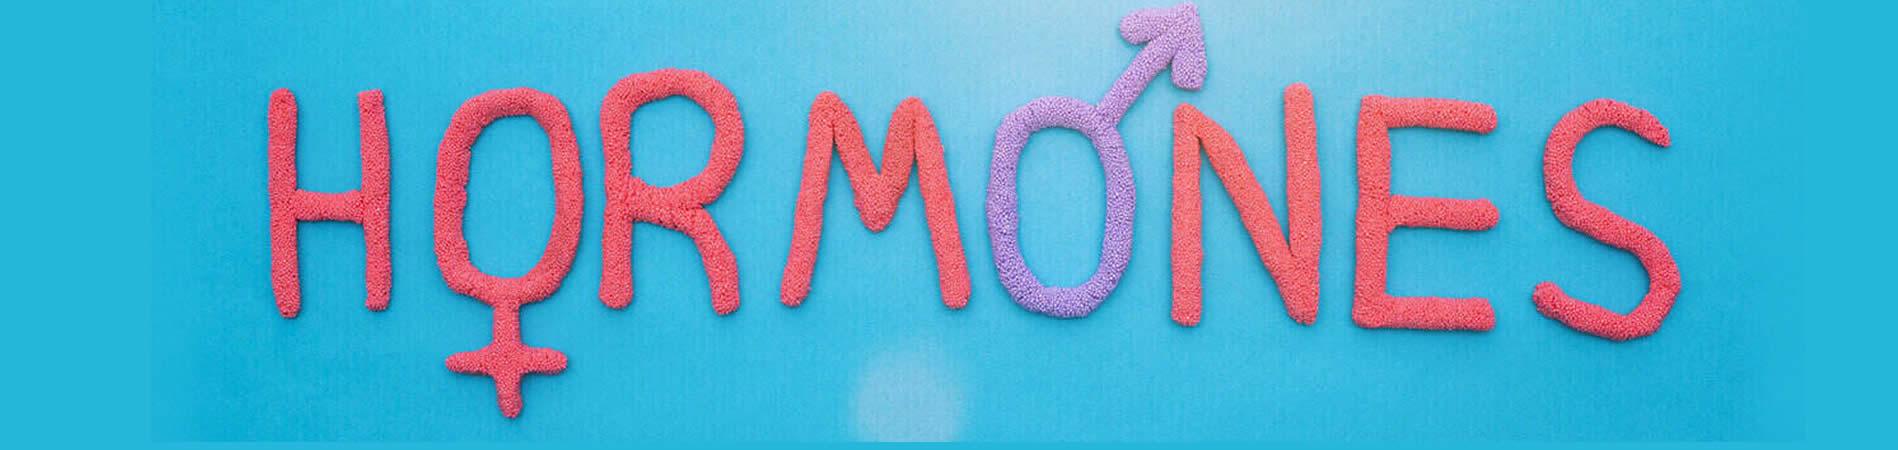 Hormoon Check